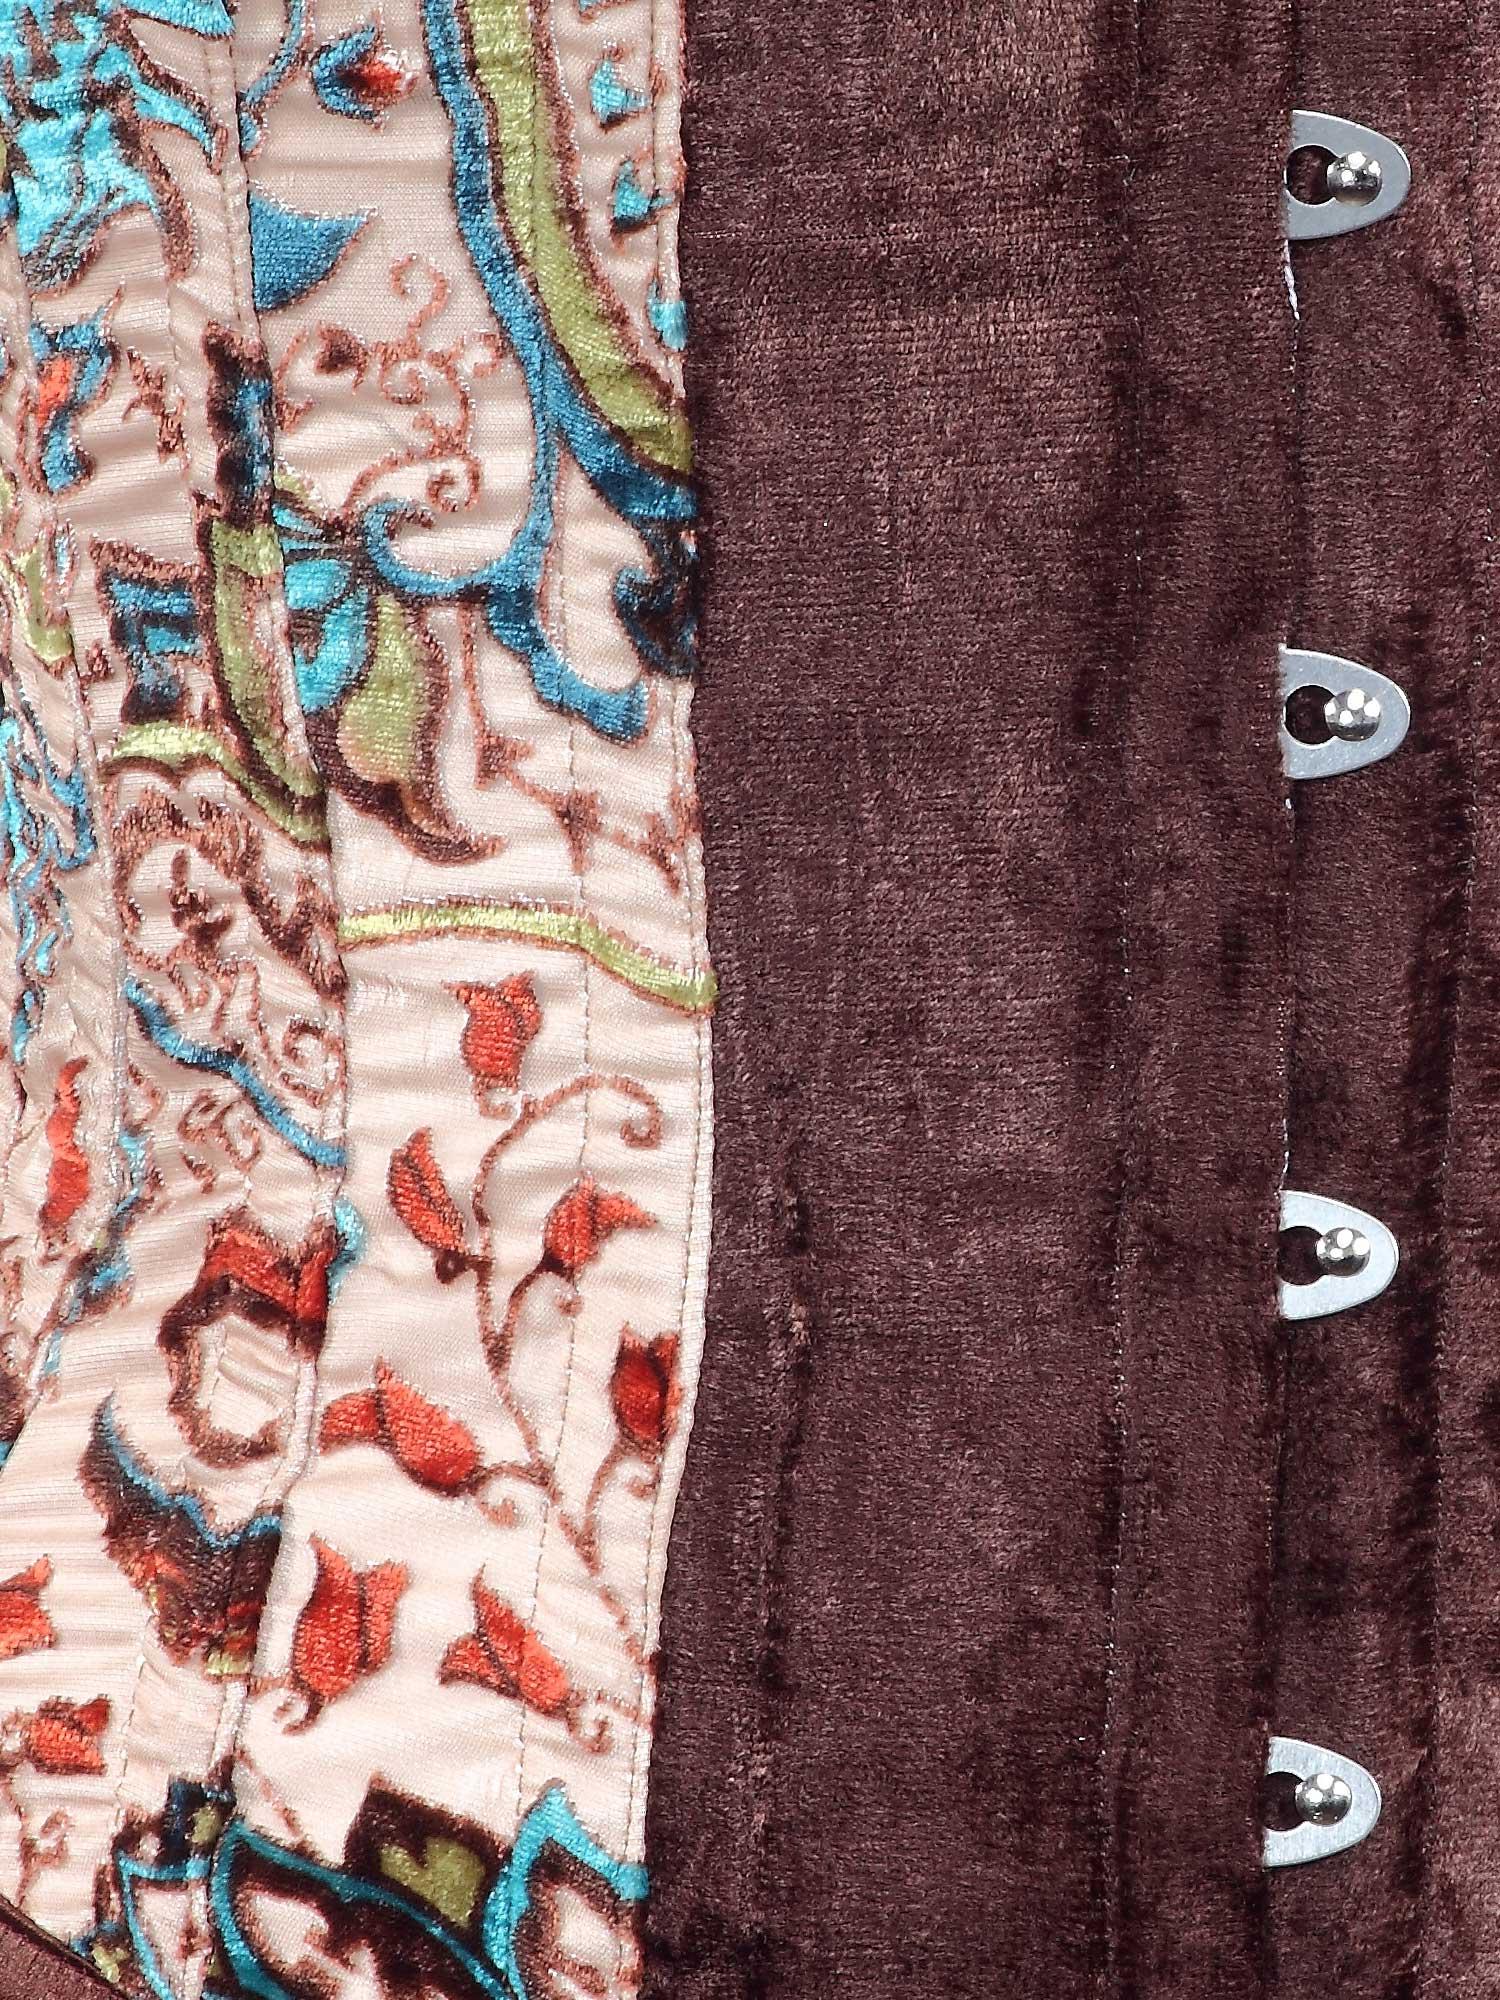 floral_velvet_fabric_steel_boning_underbust_corset_waist_cincher_bustier_bustiers_and_corsets_2.jpg